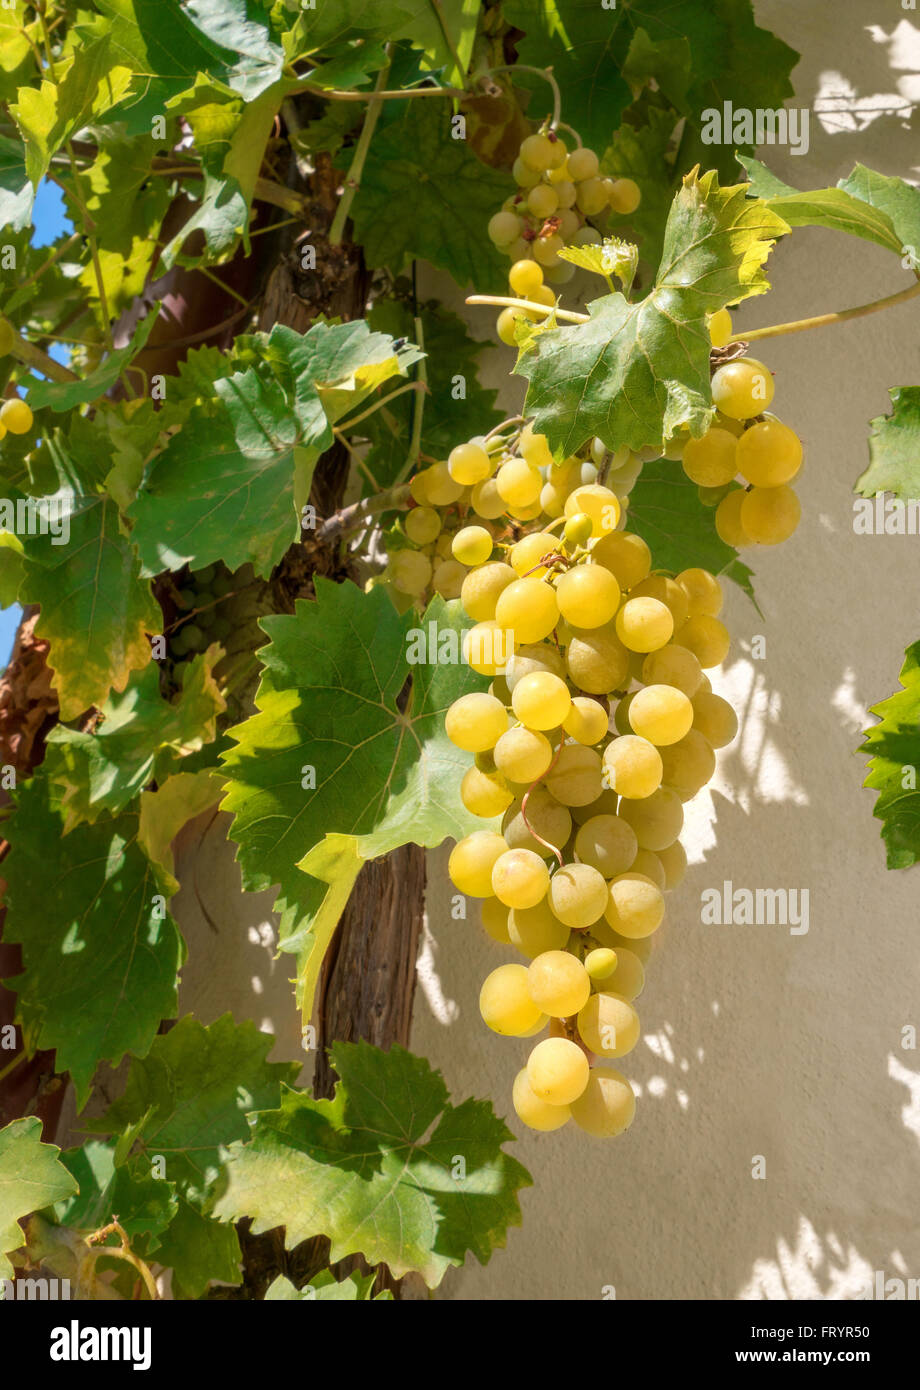 Grape Vine Wall Stock Photos & Grape Vine Wall Stock Images - Alamy